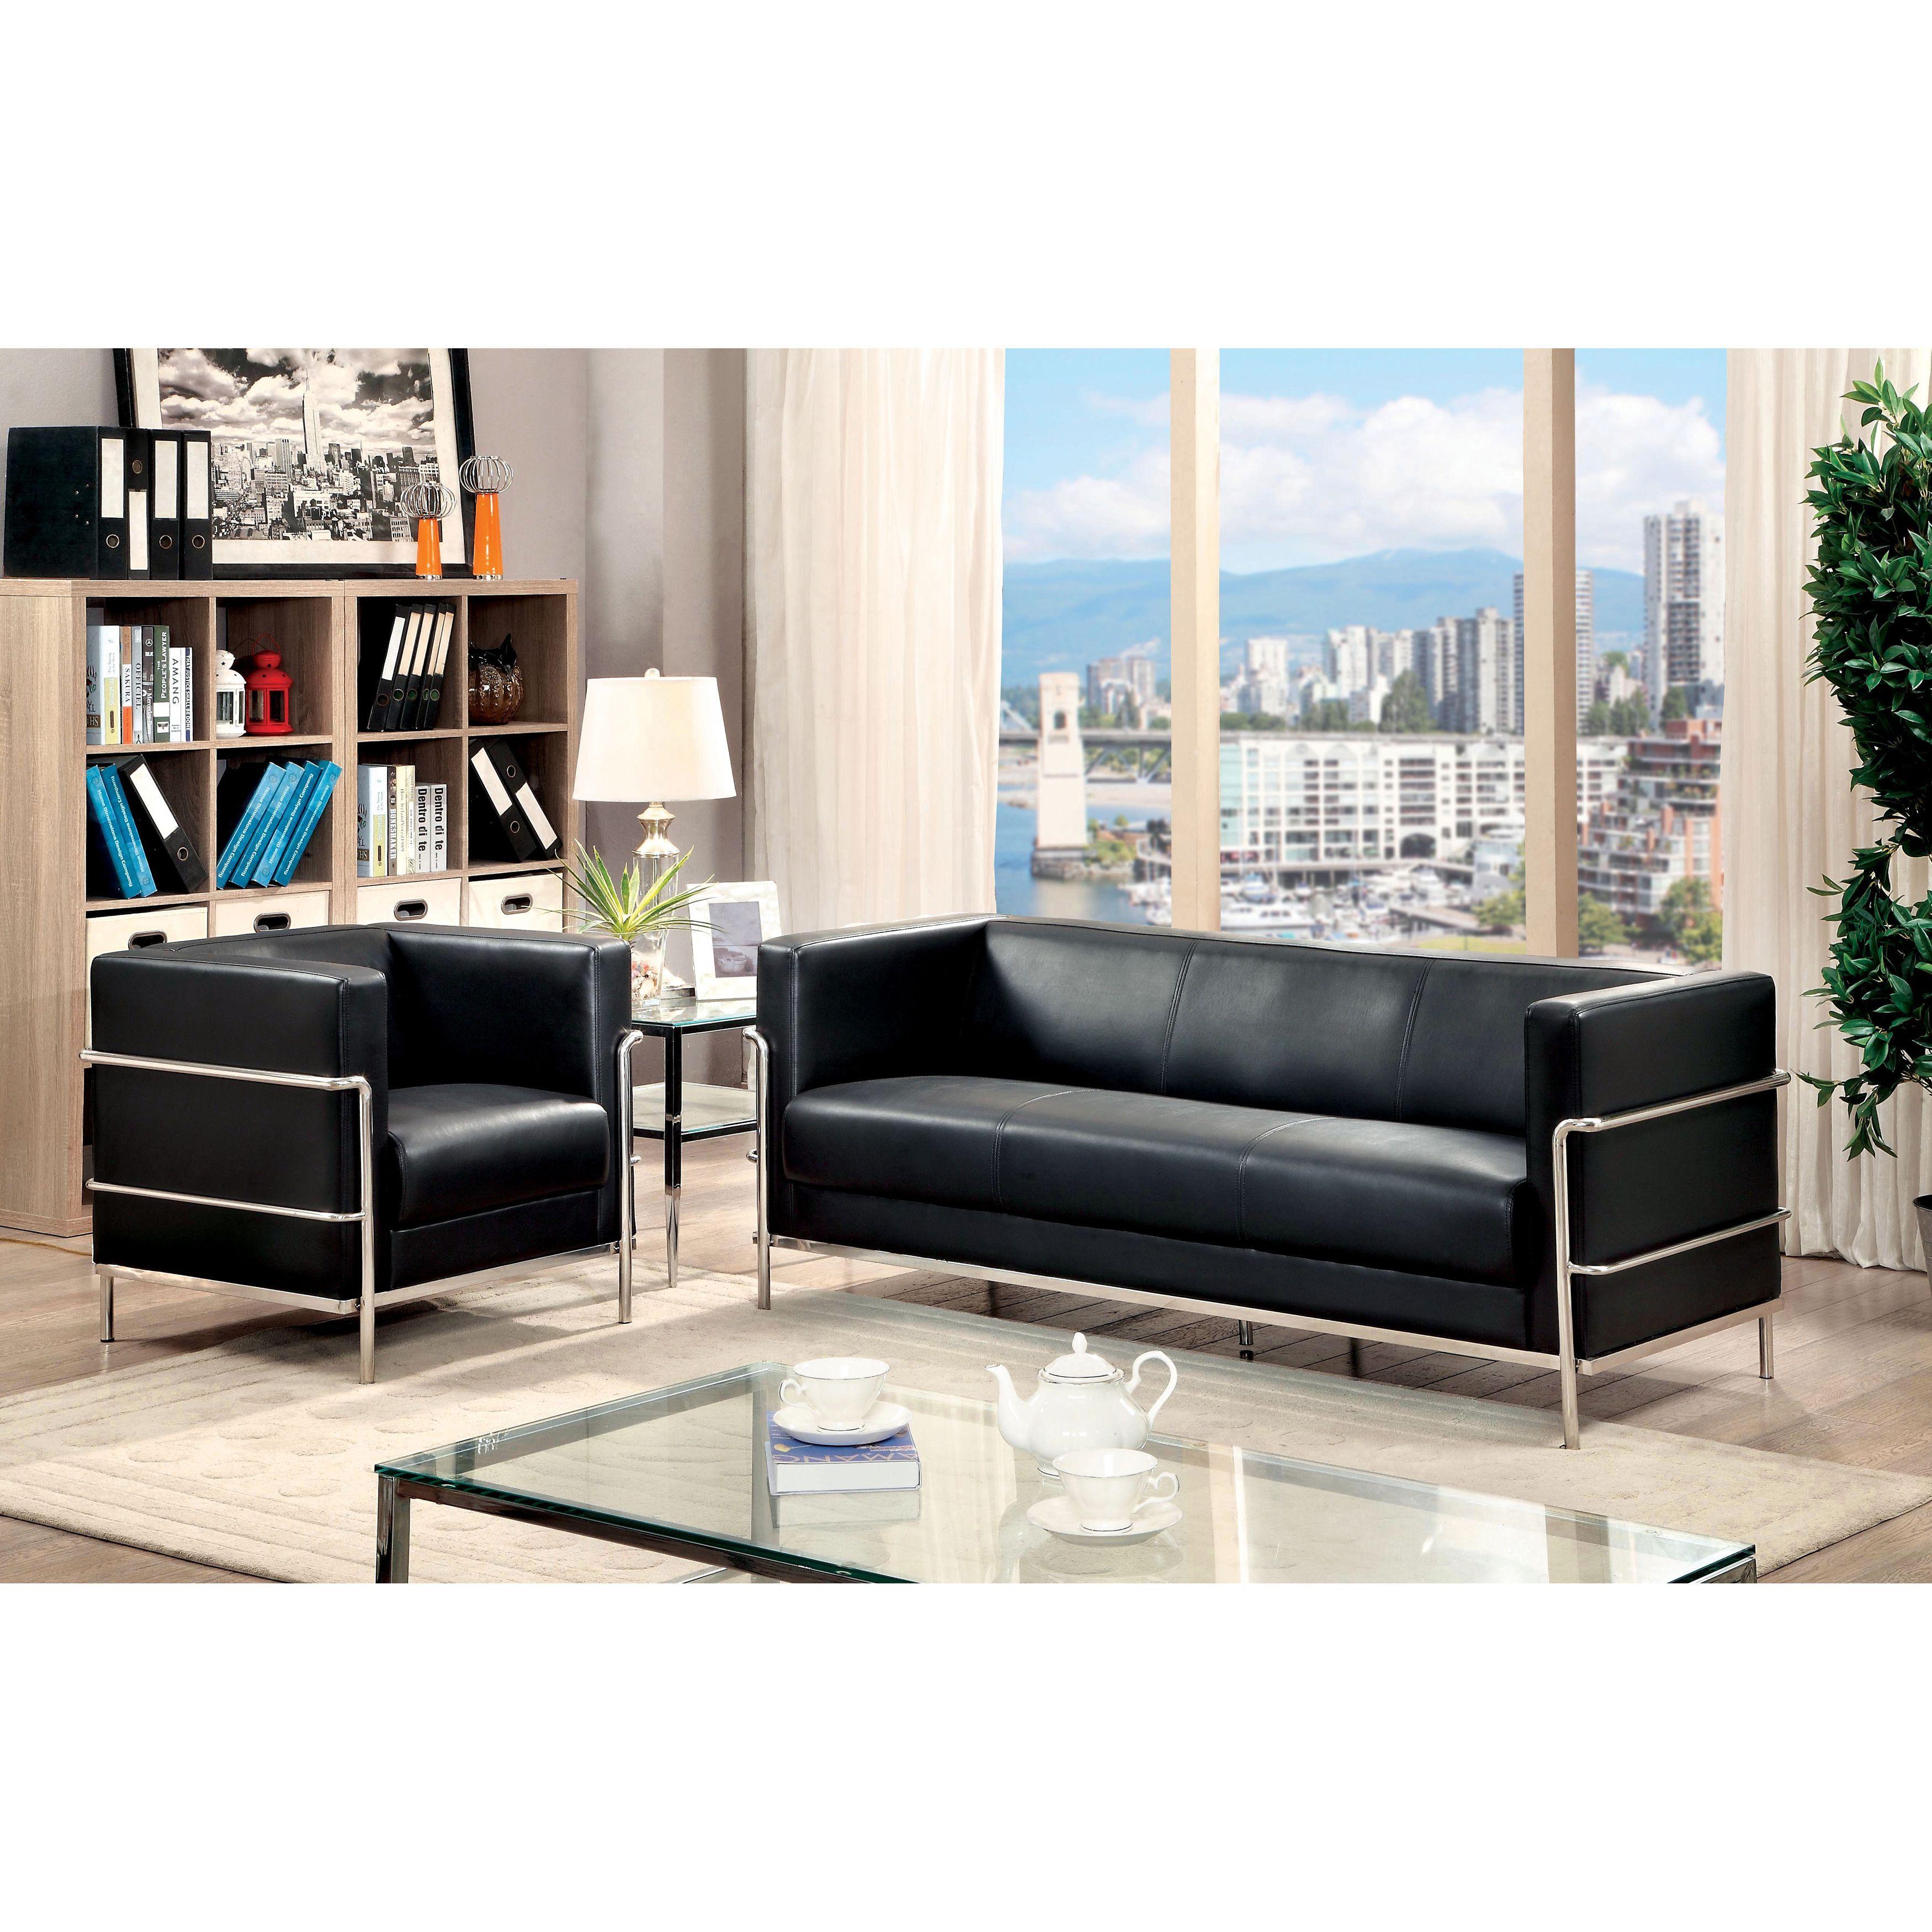 Furniture of America Sonica Contemporary 2-piece Tuxedo Style Leatherette Sofa Set